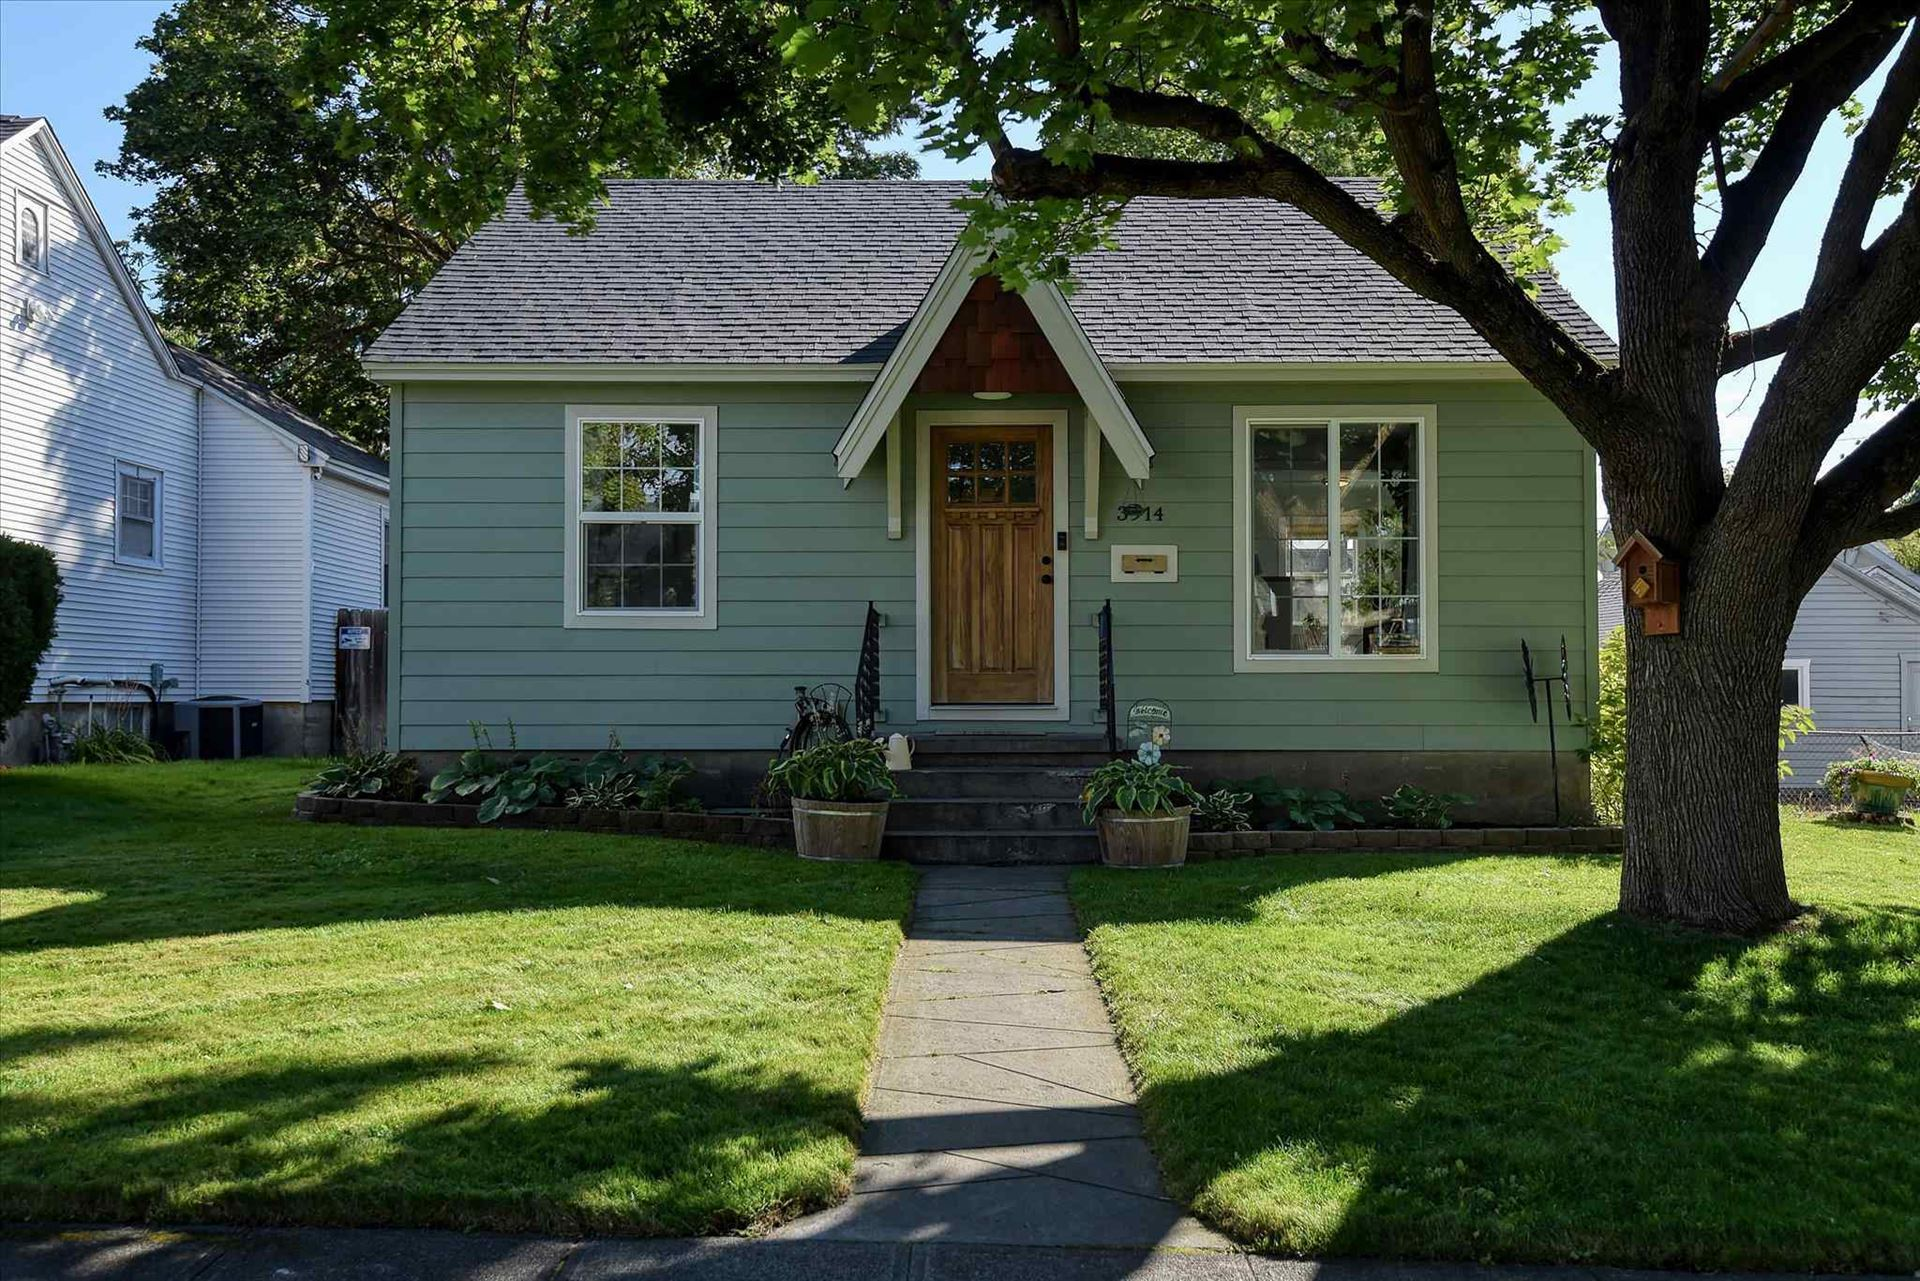 3914 N Hawthorne St, Spokane, WA 99205 - #: 202122413